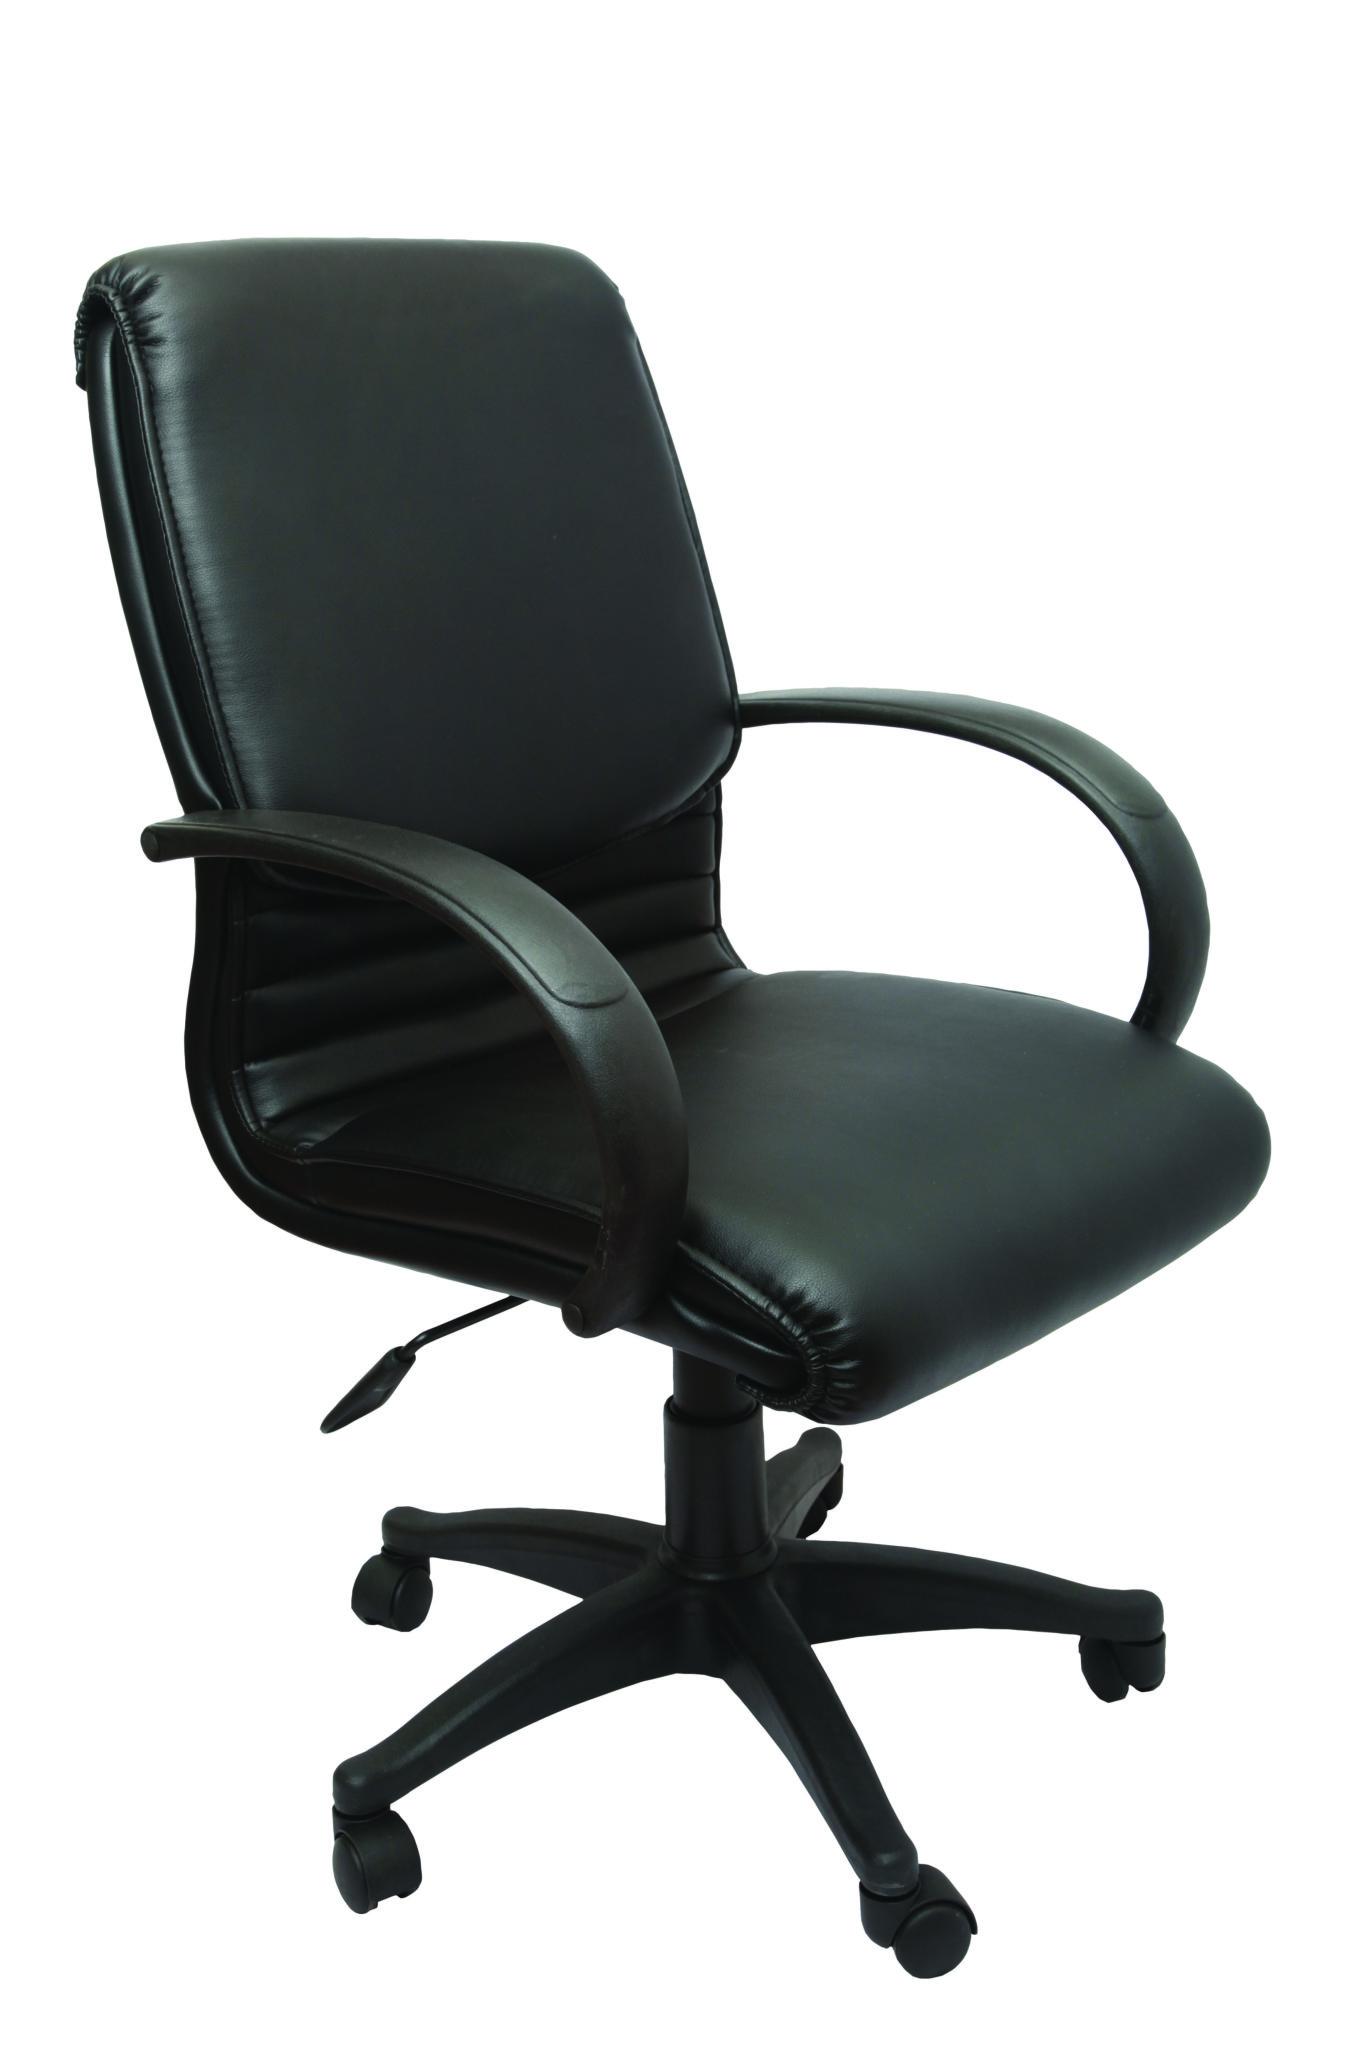 CL610 Executive Chair PU